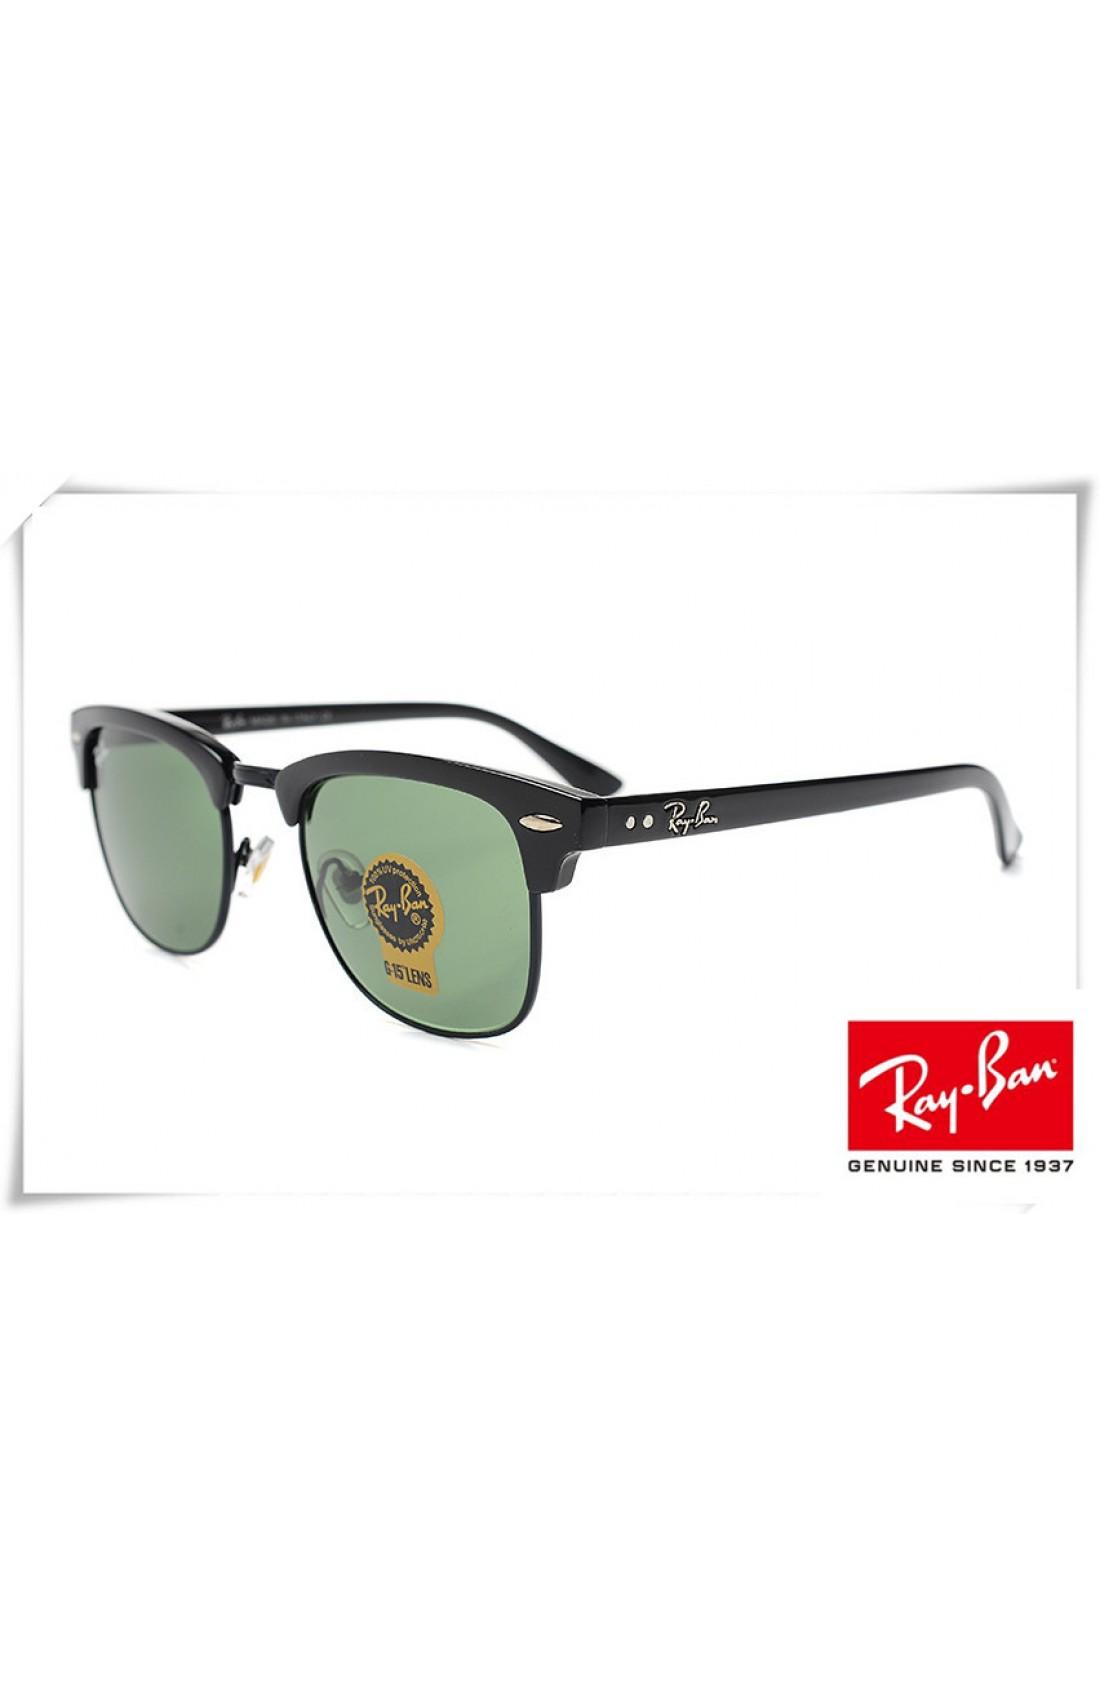 09366c993f Cheap Replica Ray Ban RB3016 Classic Clubmaster Sunglasses Black ...